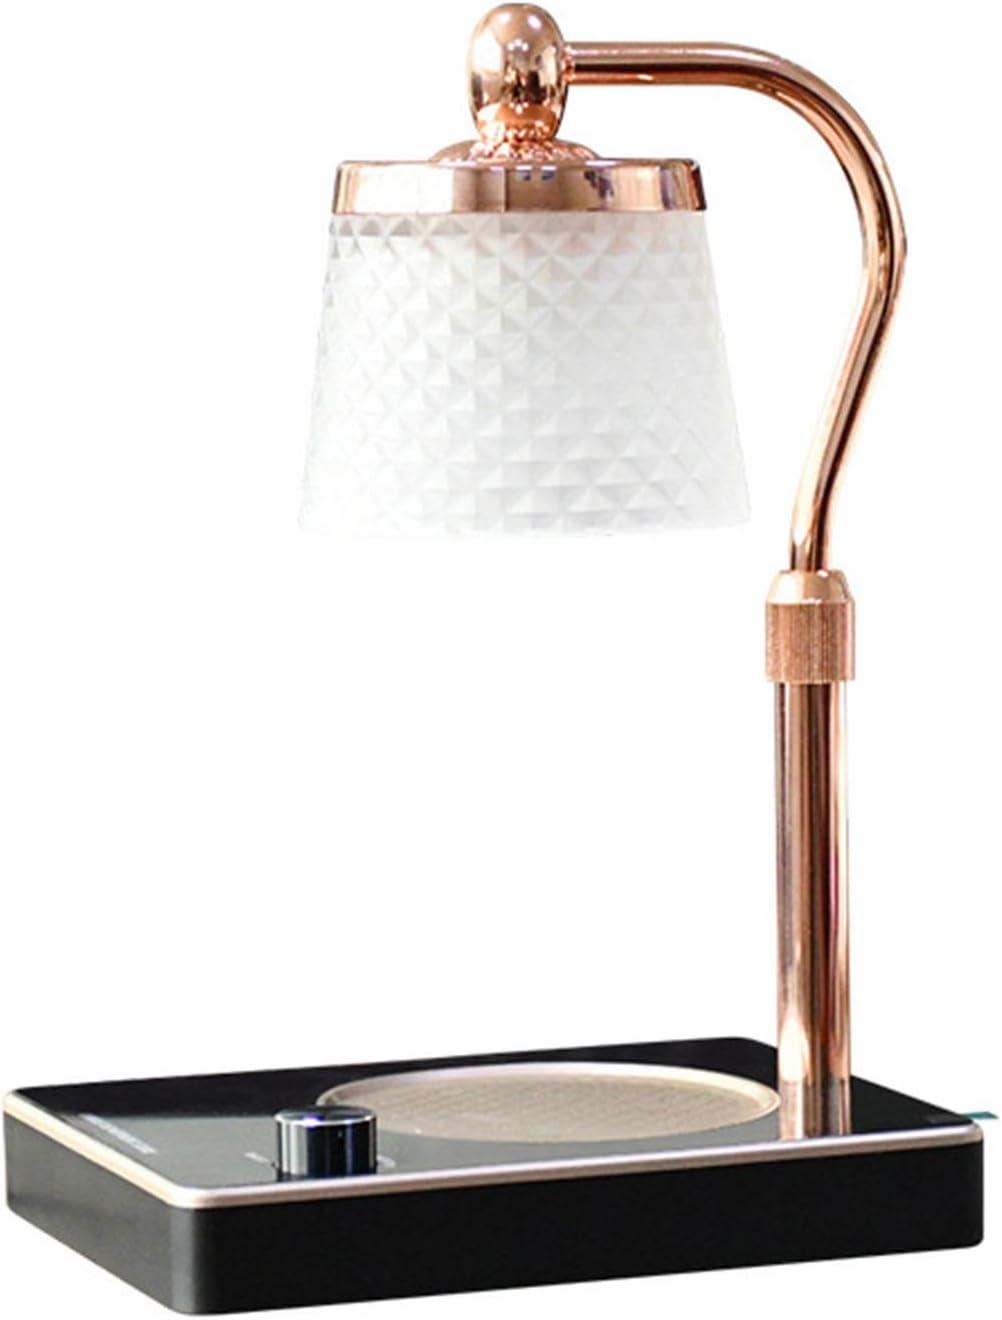 QLIGHA Household Aromatherapy Lamp Intelligent Regu 25% Mesa Mall OFF Temperature